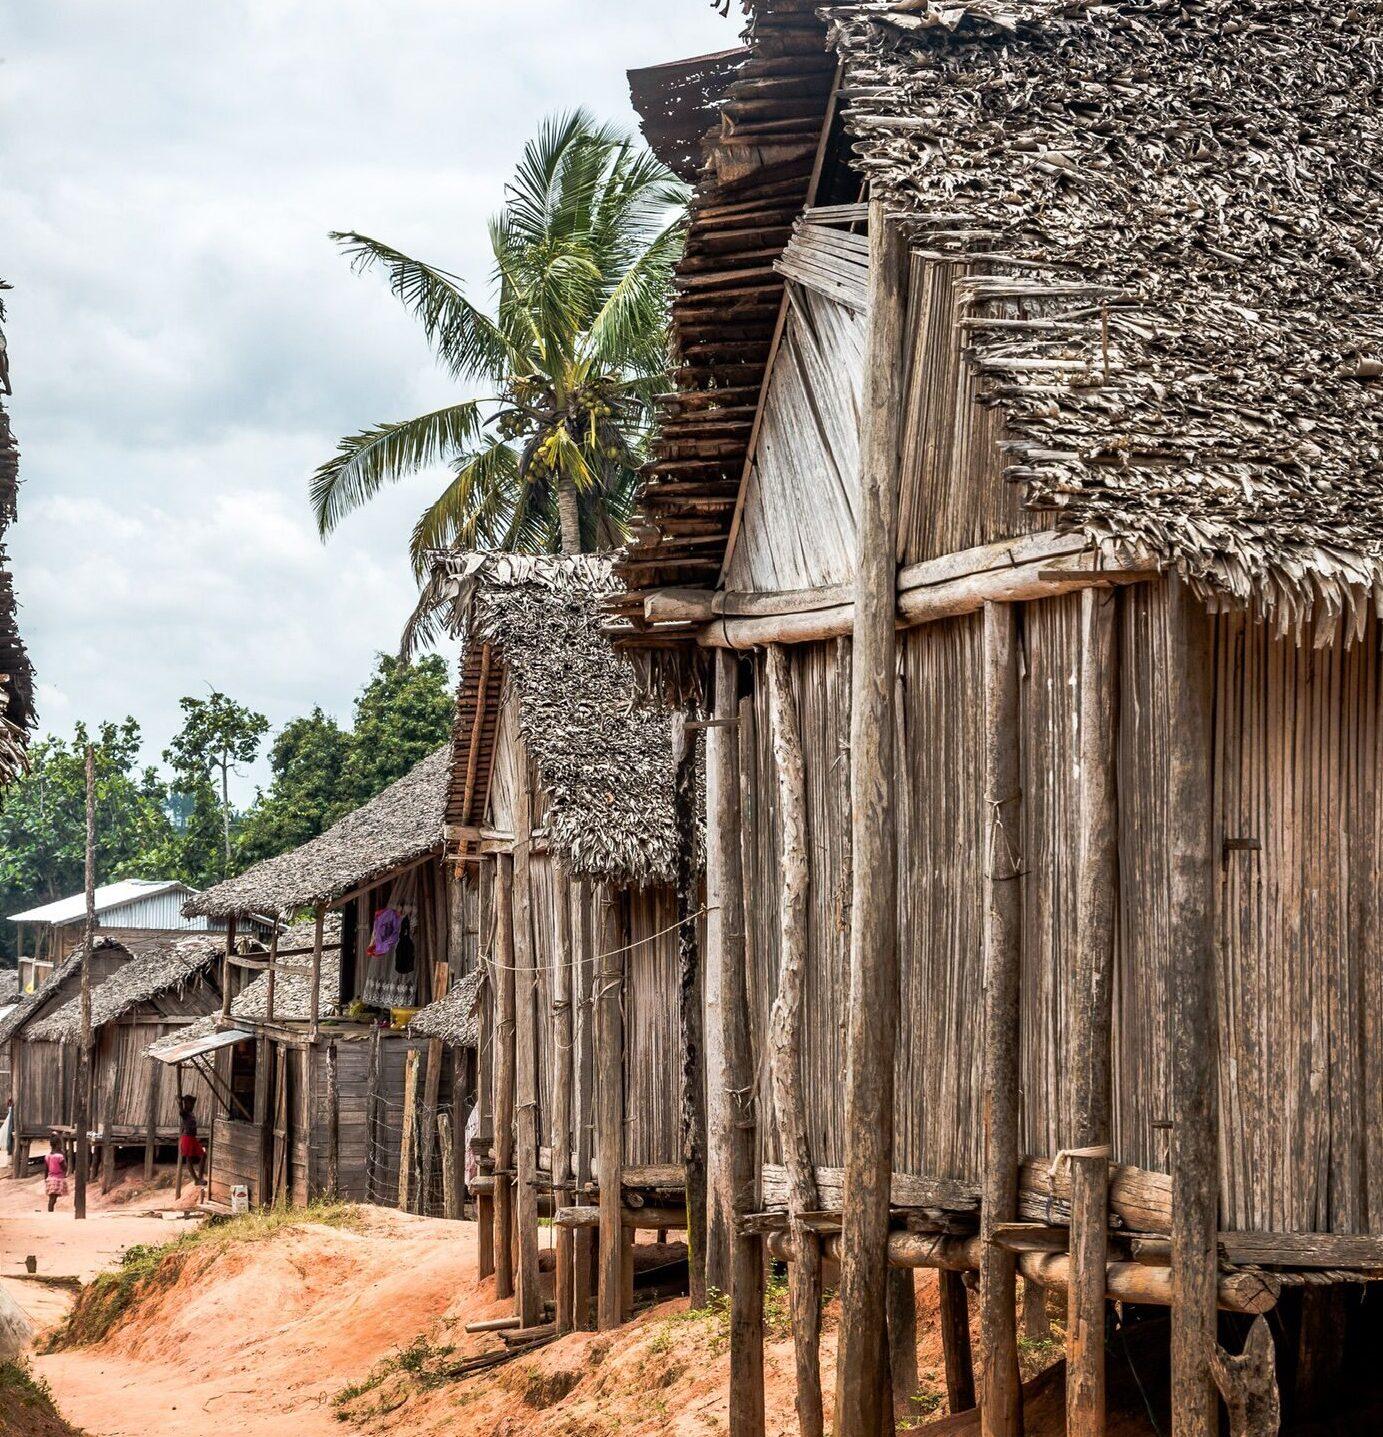 Cases etsimisaraka sur la côte Est